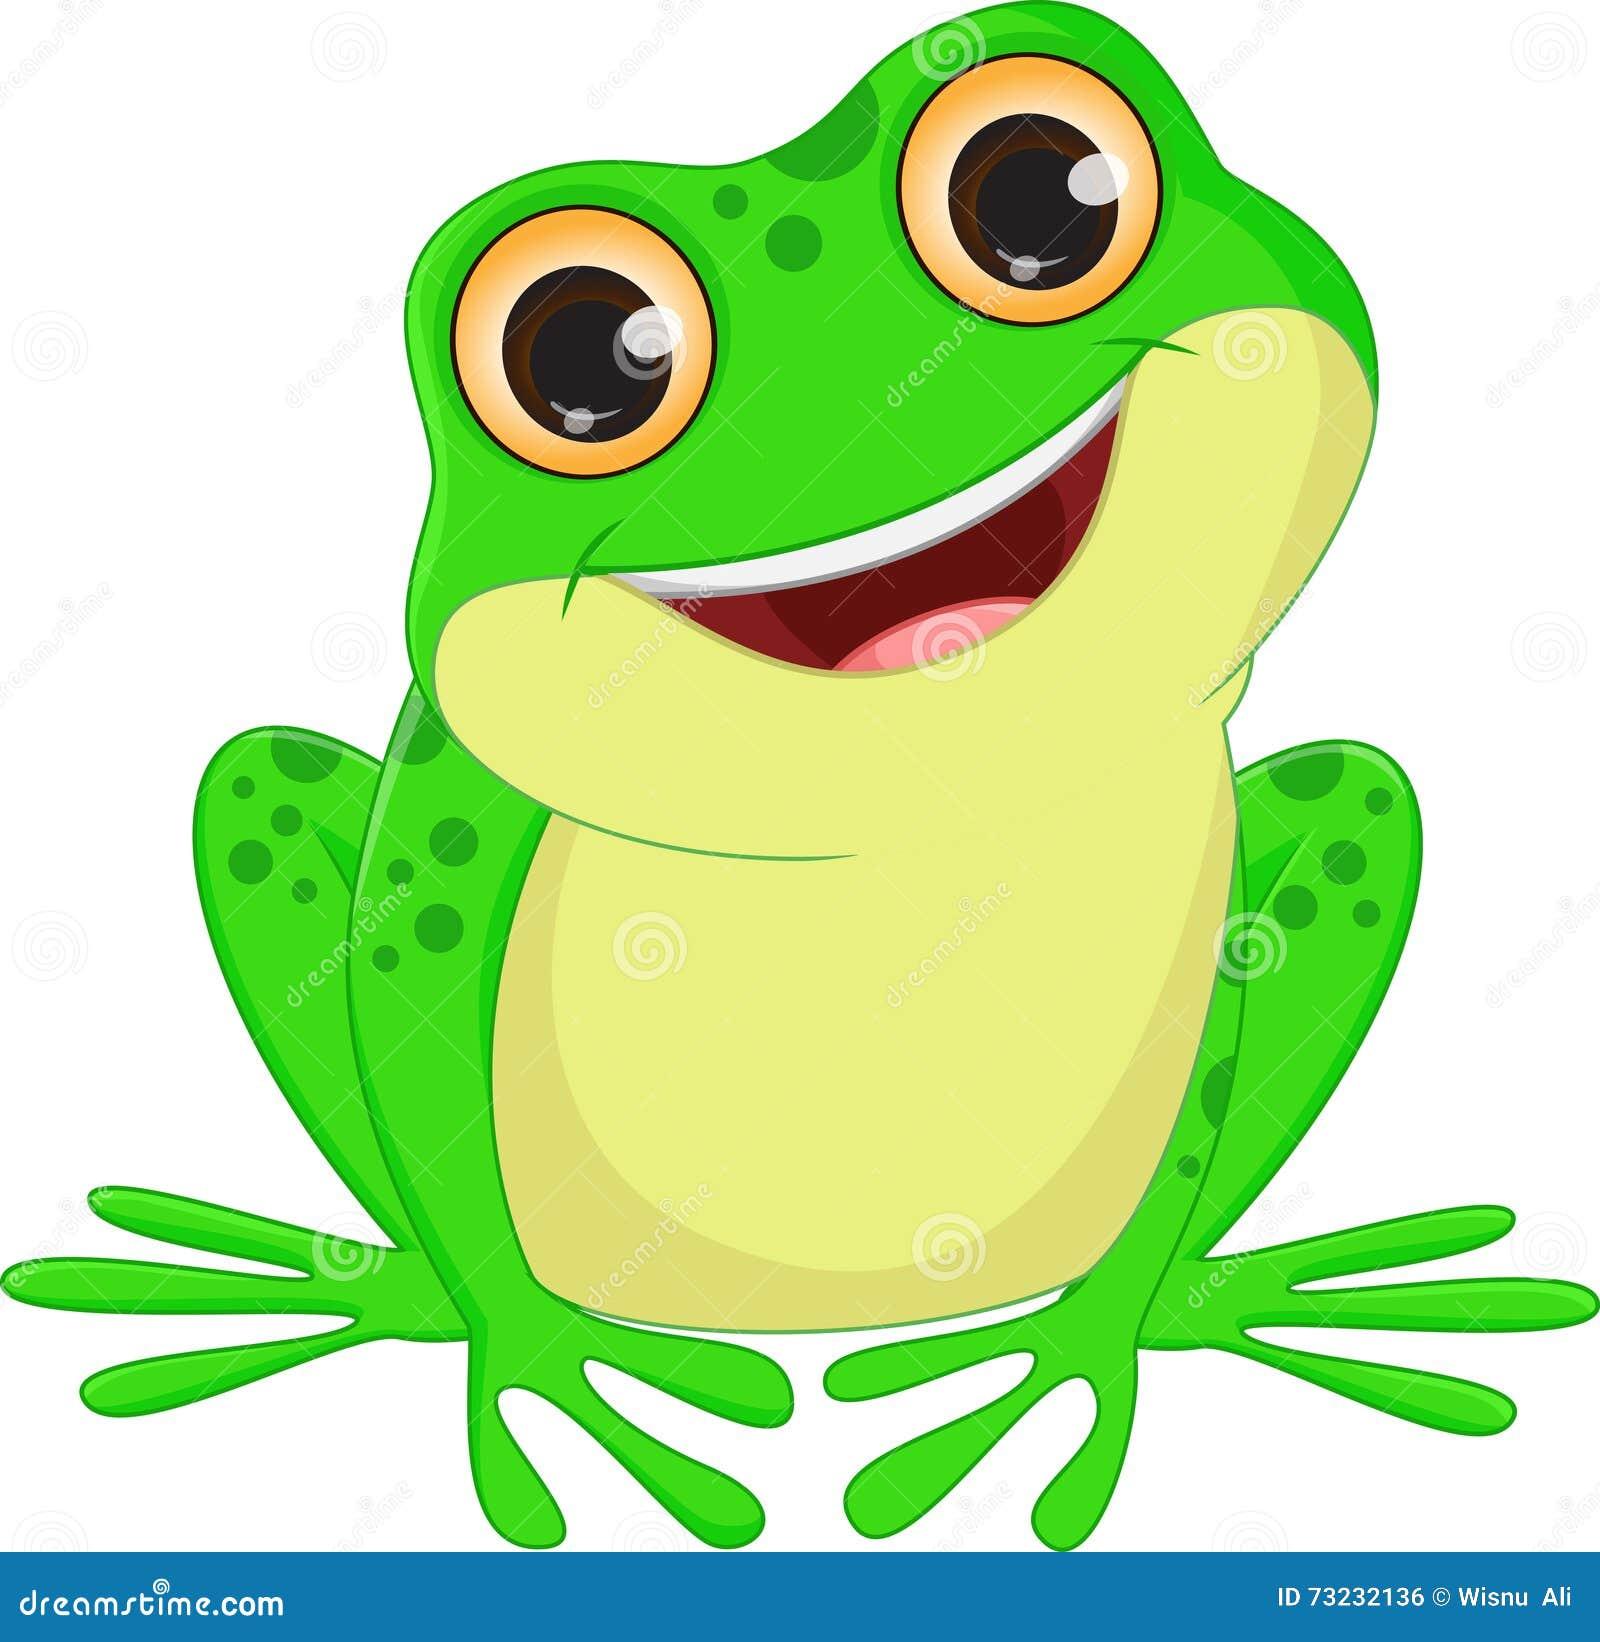 Uncategorized Frog Cartoon cute frog cartoon stock vector image of bullfrog 73232136 cartoon